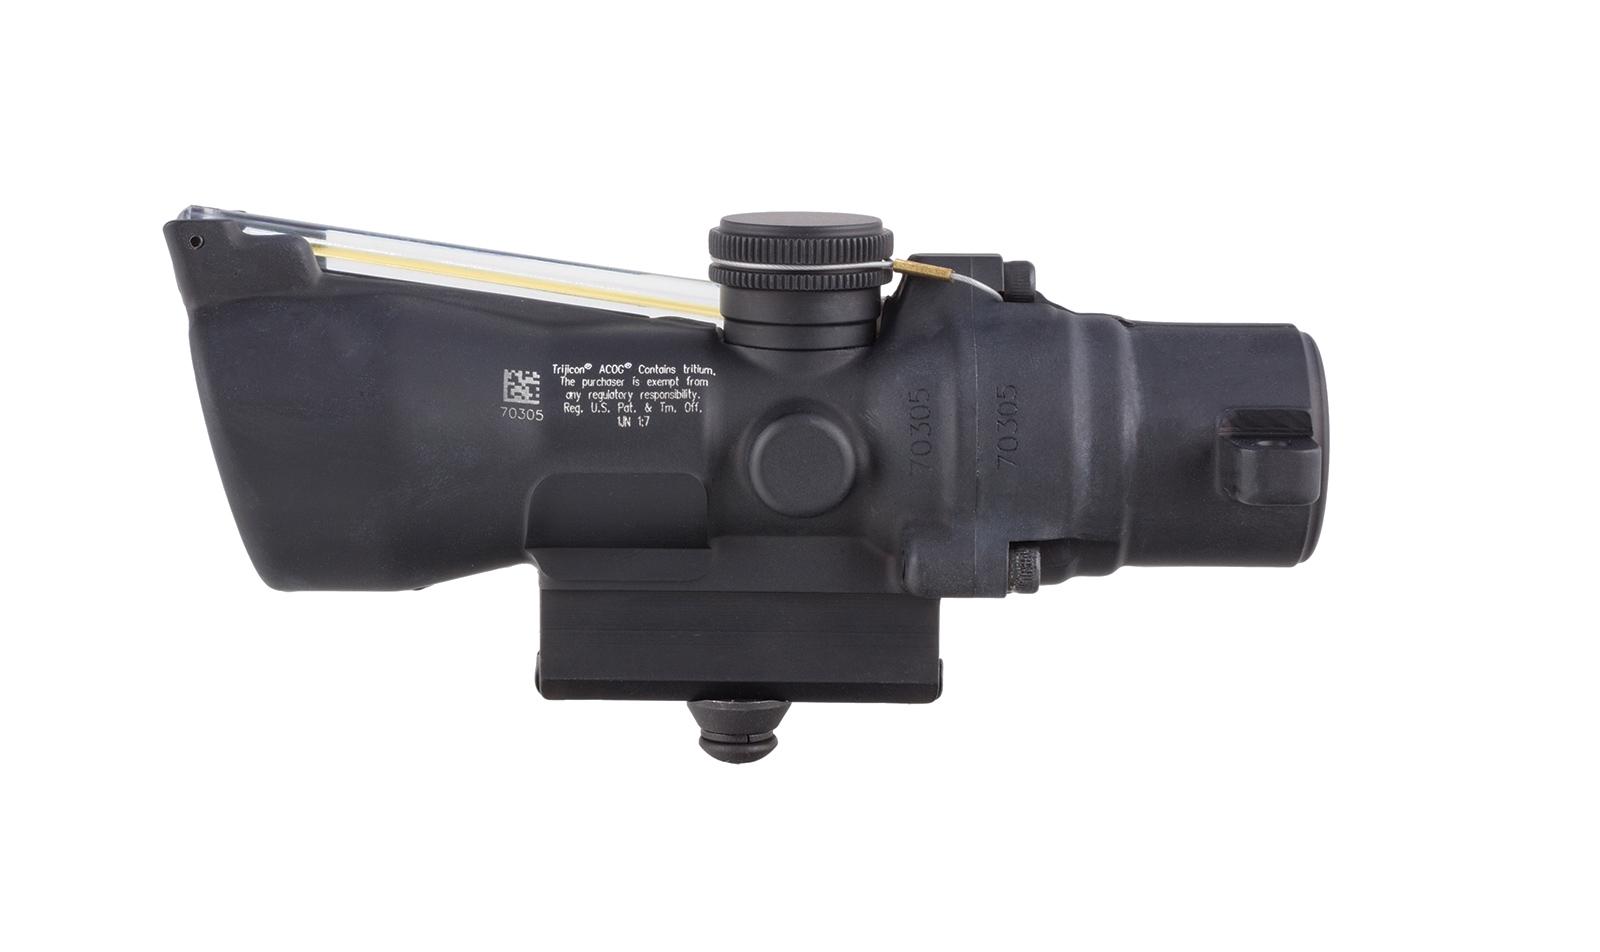 TA50-C-400224 angle 2